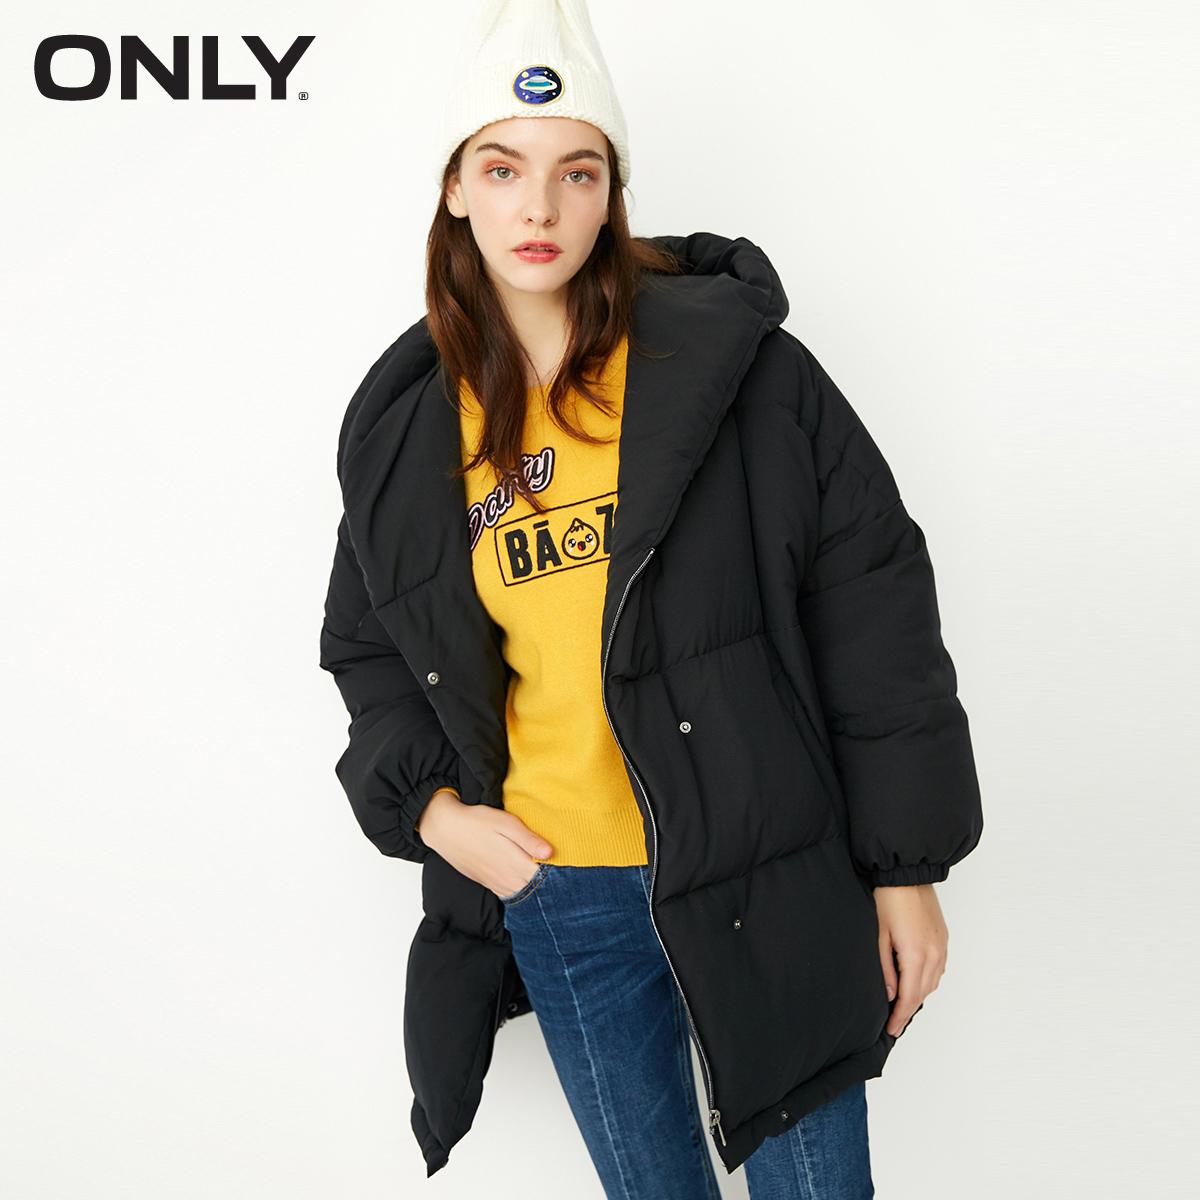 ONLY2017冬季长款宽松纯色连帽羽绒服女|117312563